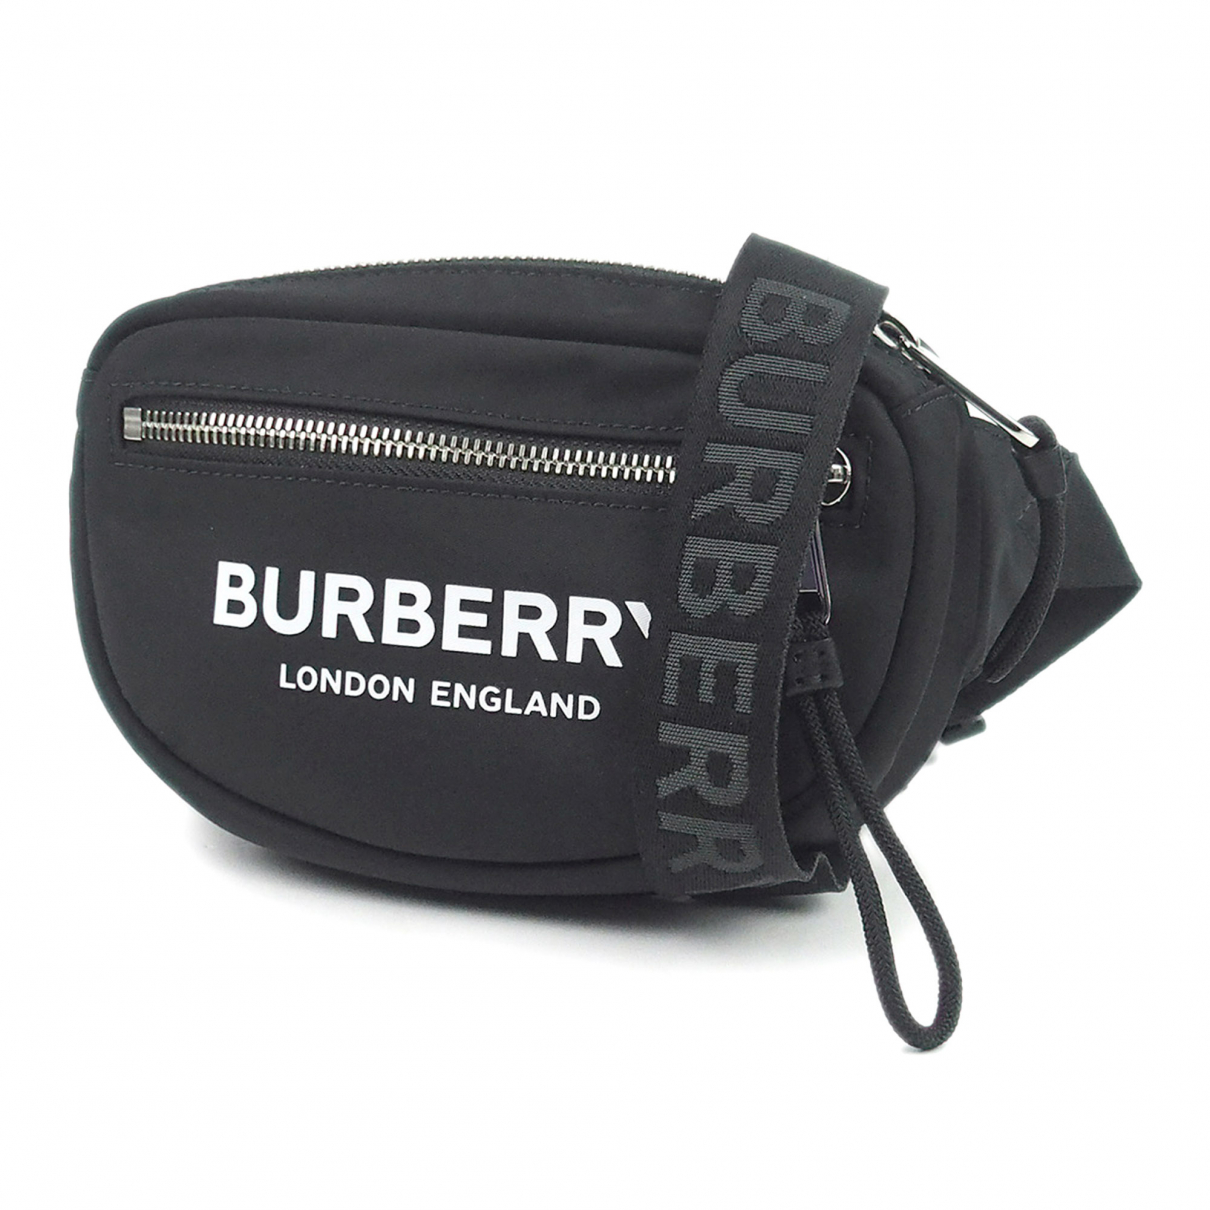 Burberry - Sac banane   pour homme en toile - noir